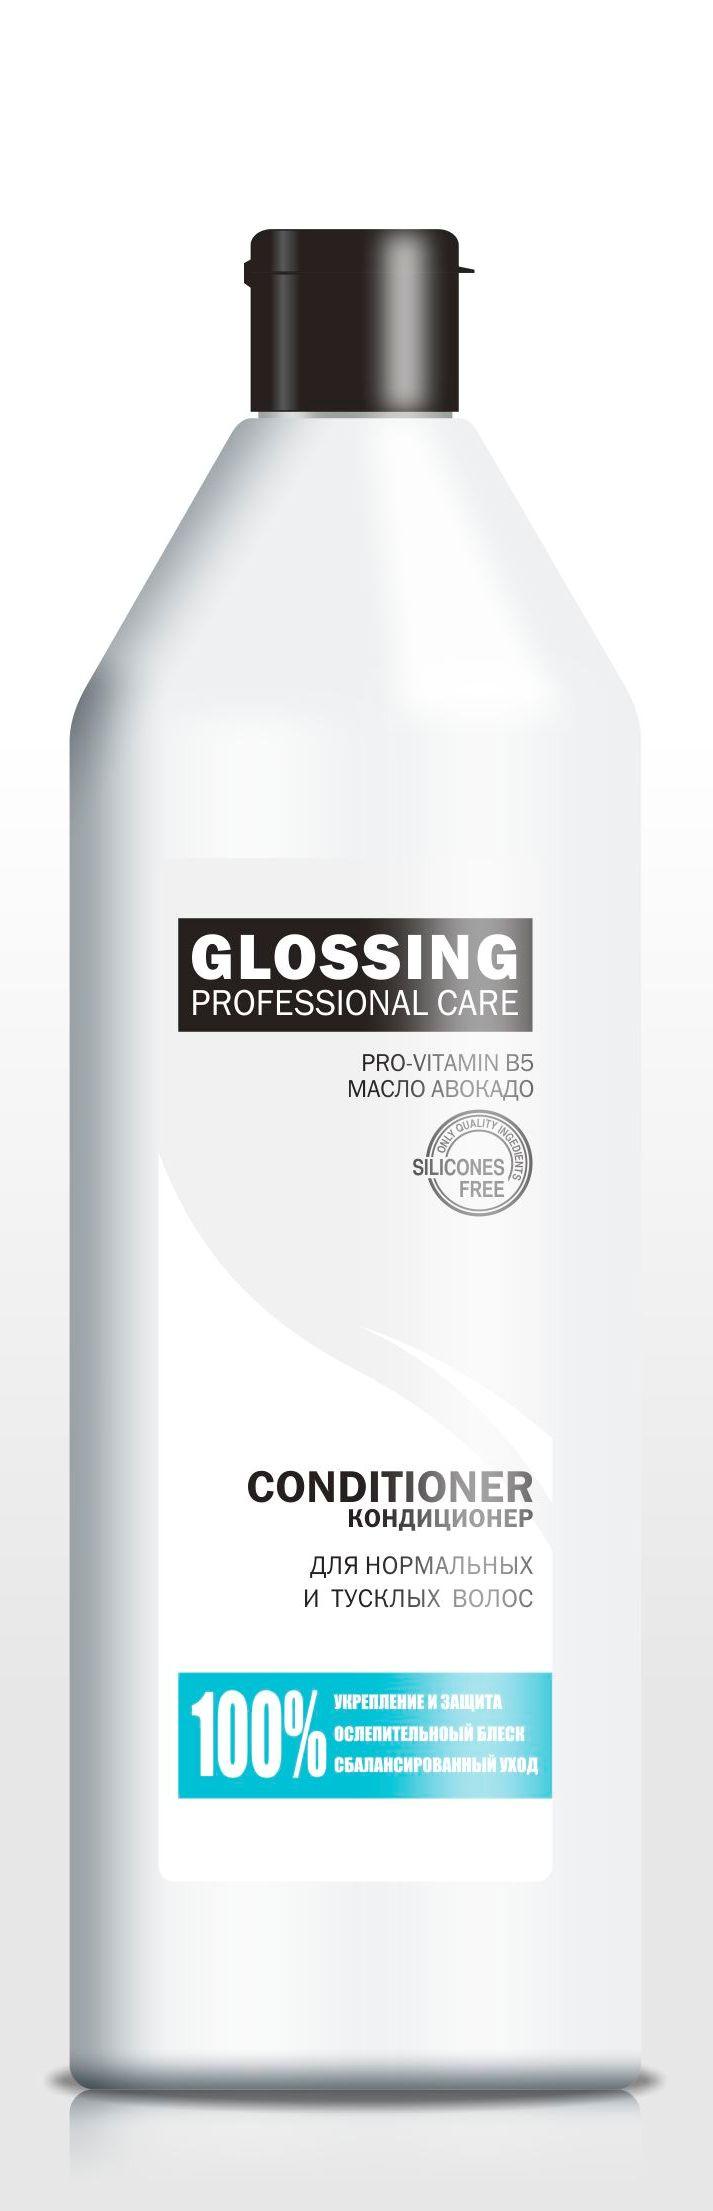 Кондиционер для волос PROFESSIONAL CARE GLOSSING vitamin d3